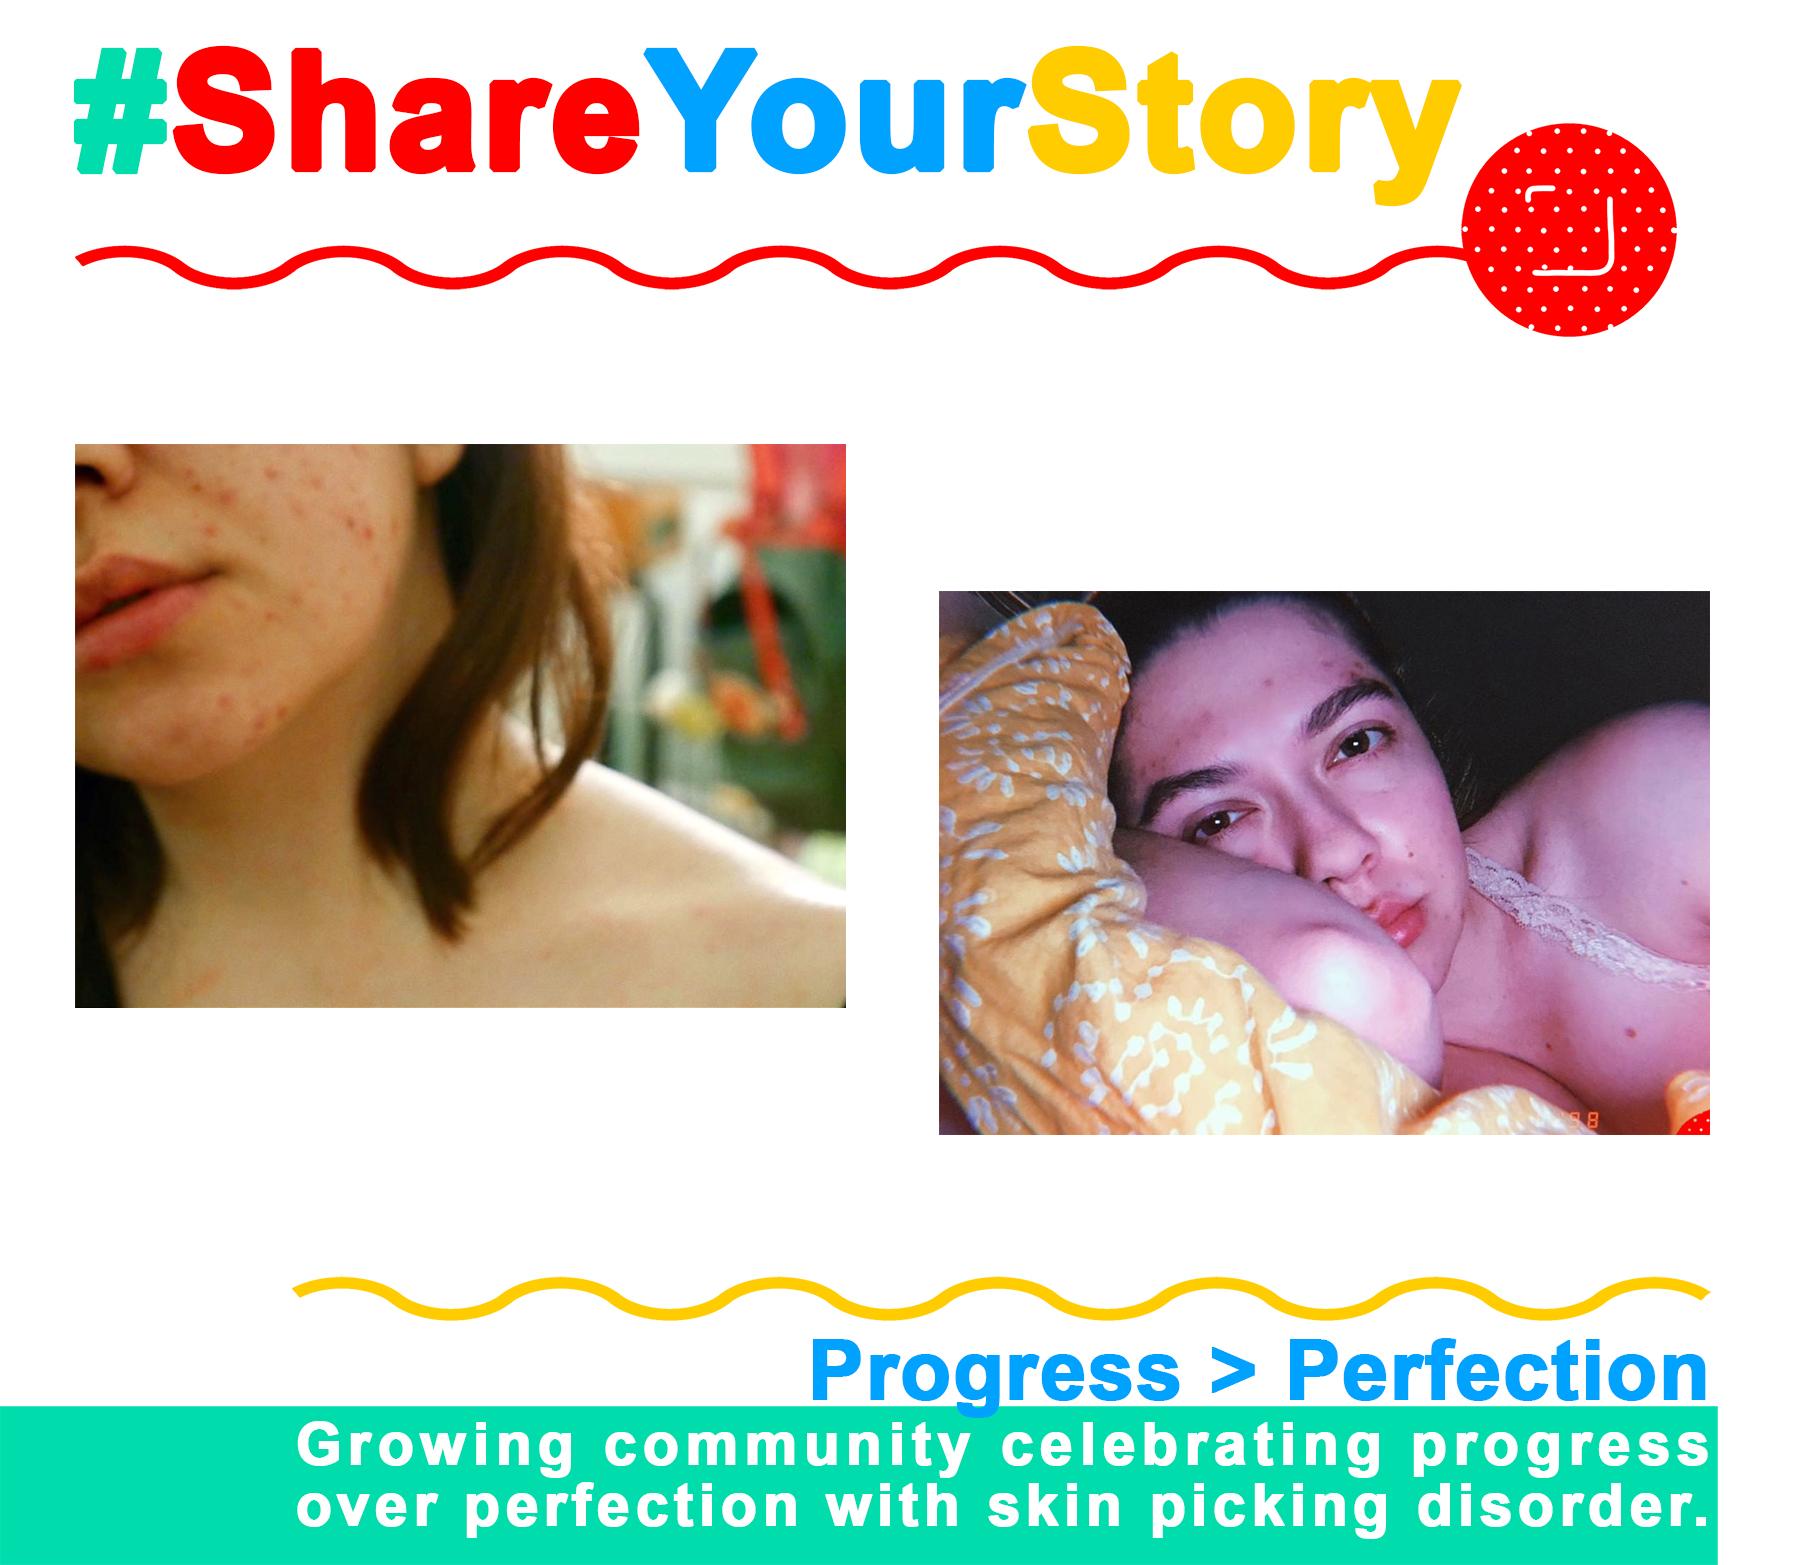 #ShareYourStory: Camilla